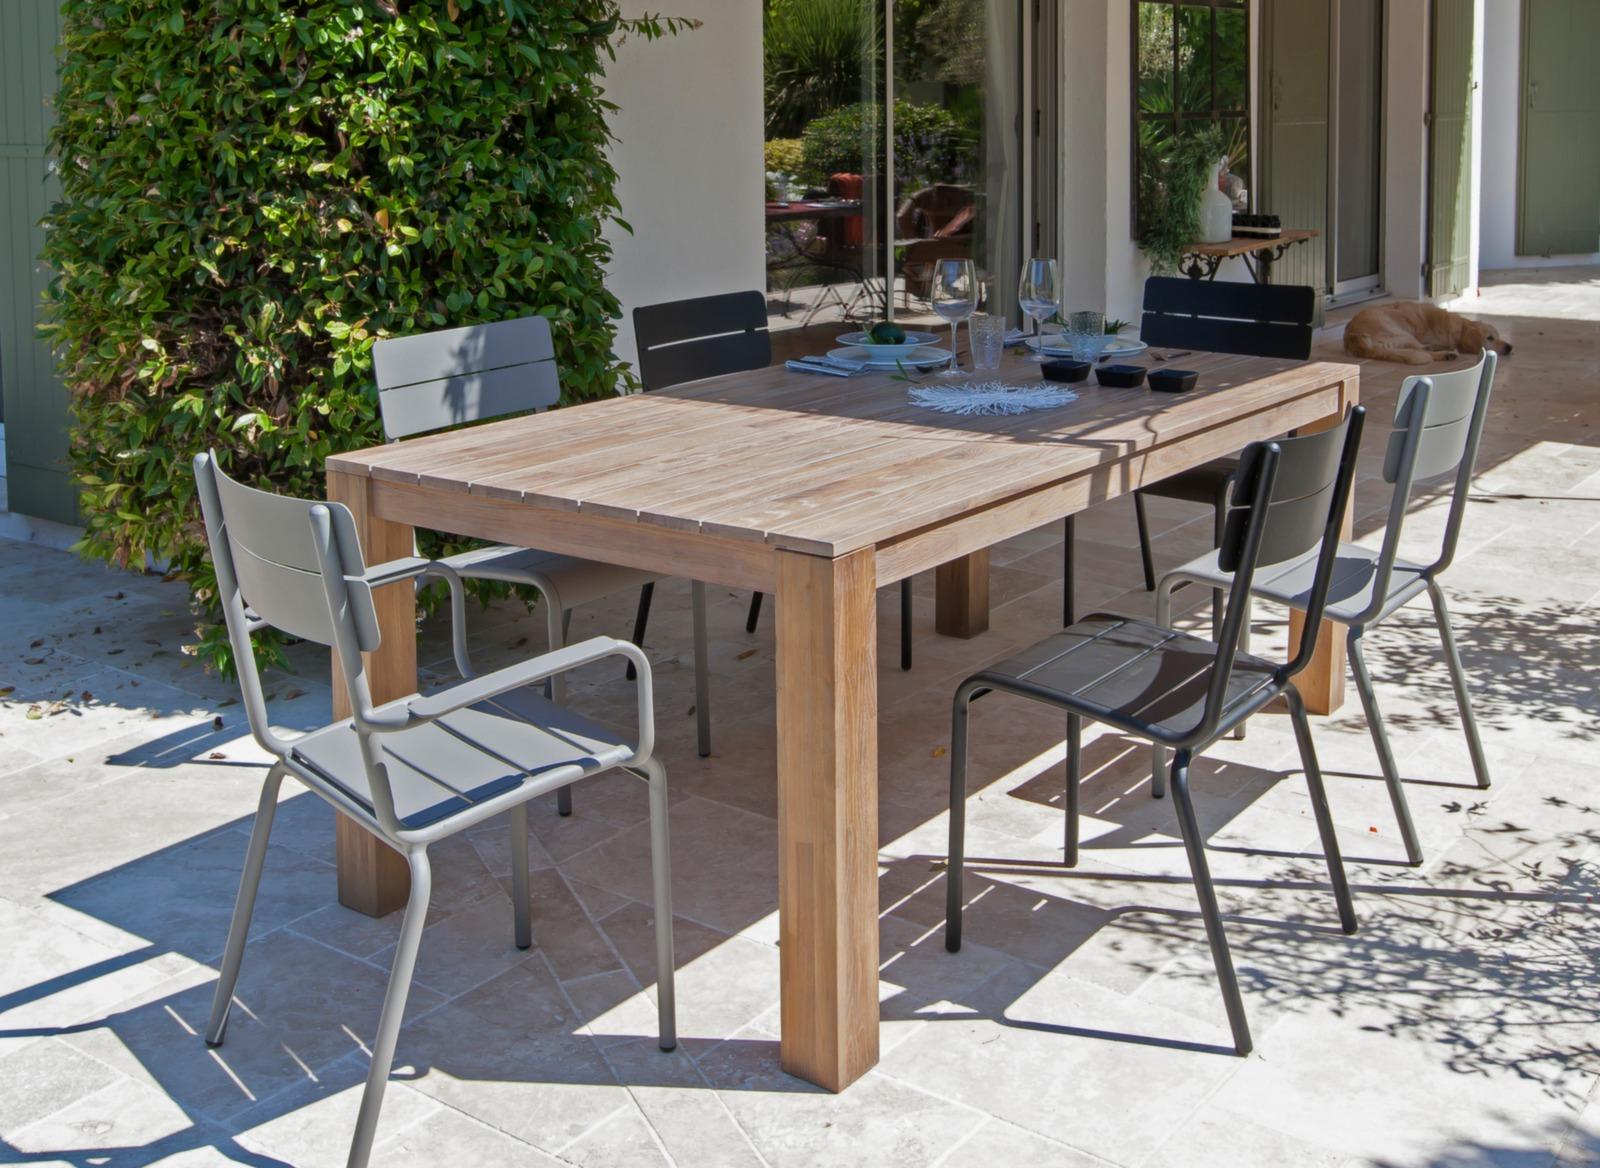 D coration table jardin rectangulaire 89 roubaix for Jardin 89